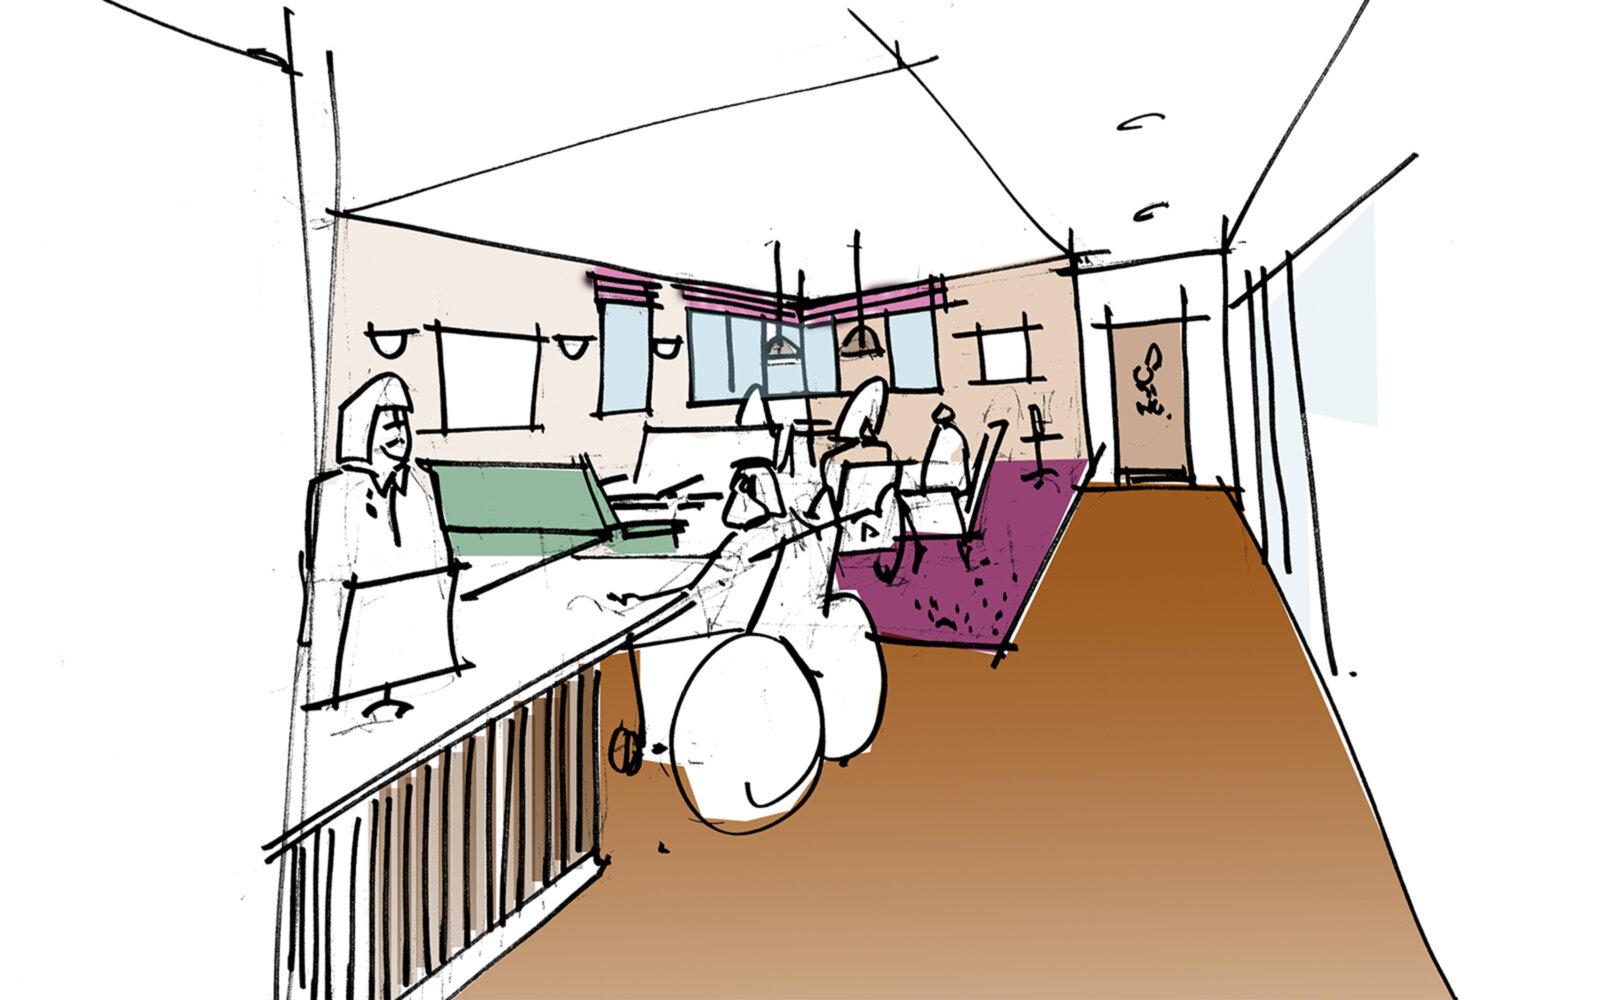 Salford Royal Hospital interior sketch